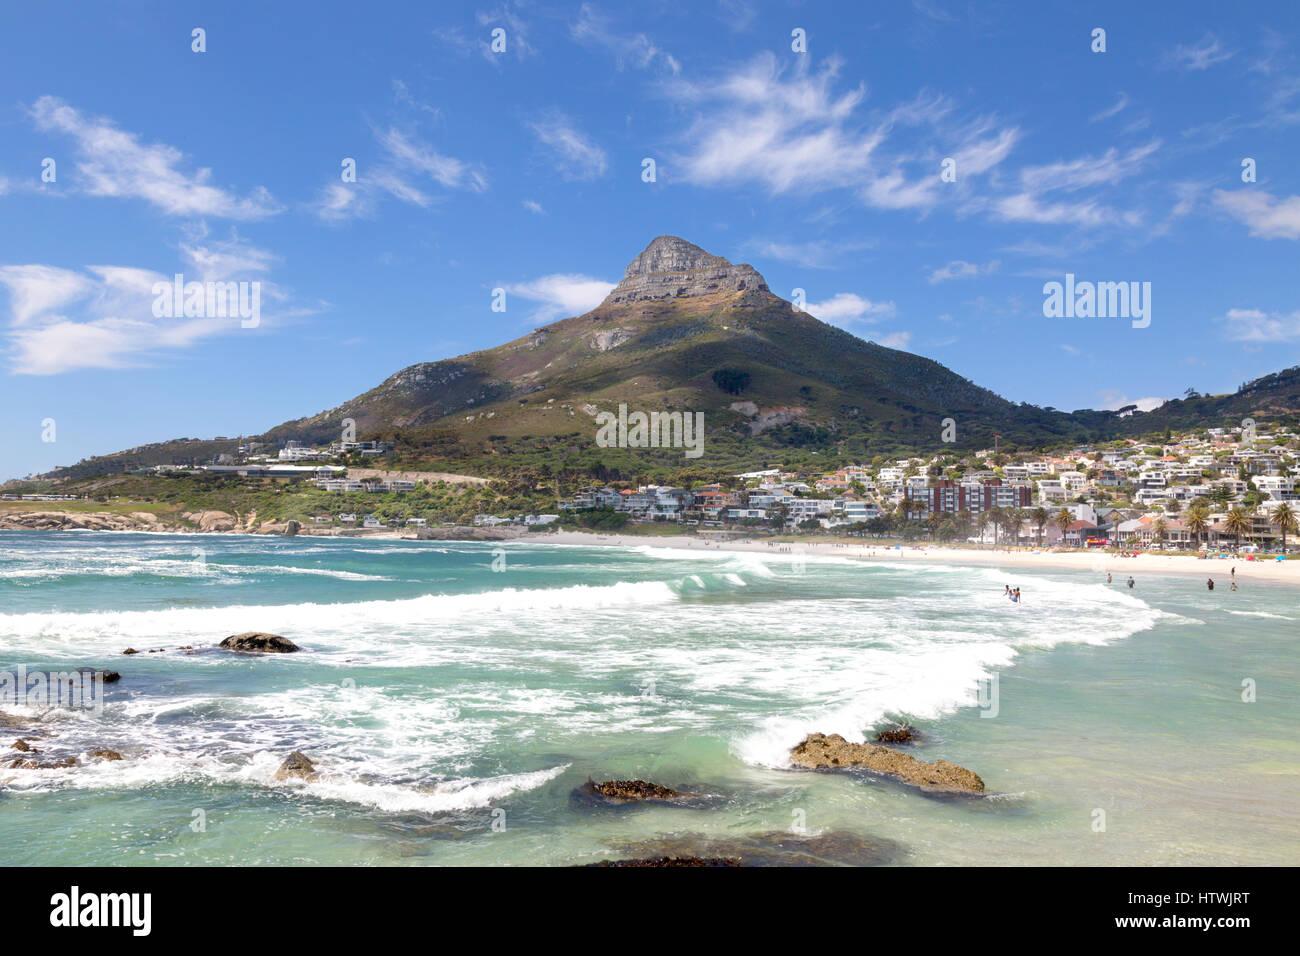 La playa de Camps Bay Cape Town South Africa - con el Lions Head Mountain, Sudáfrica Imagen De Stock